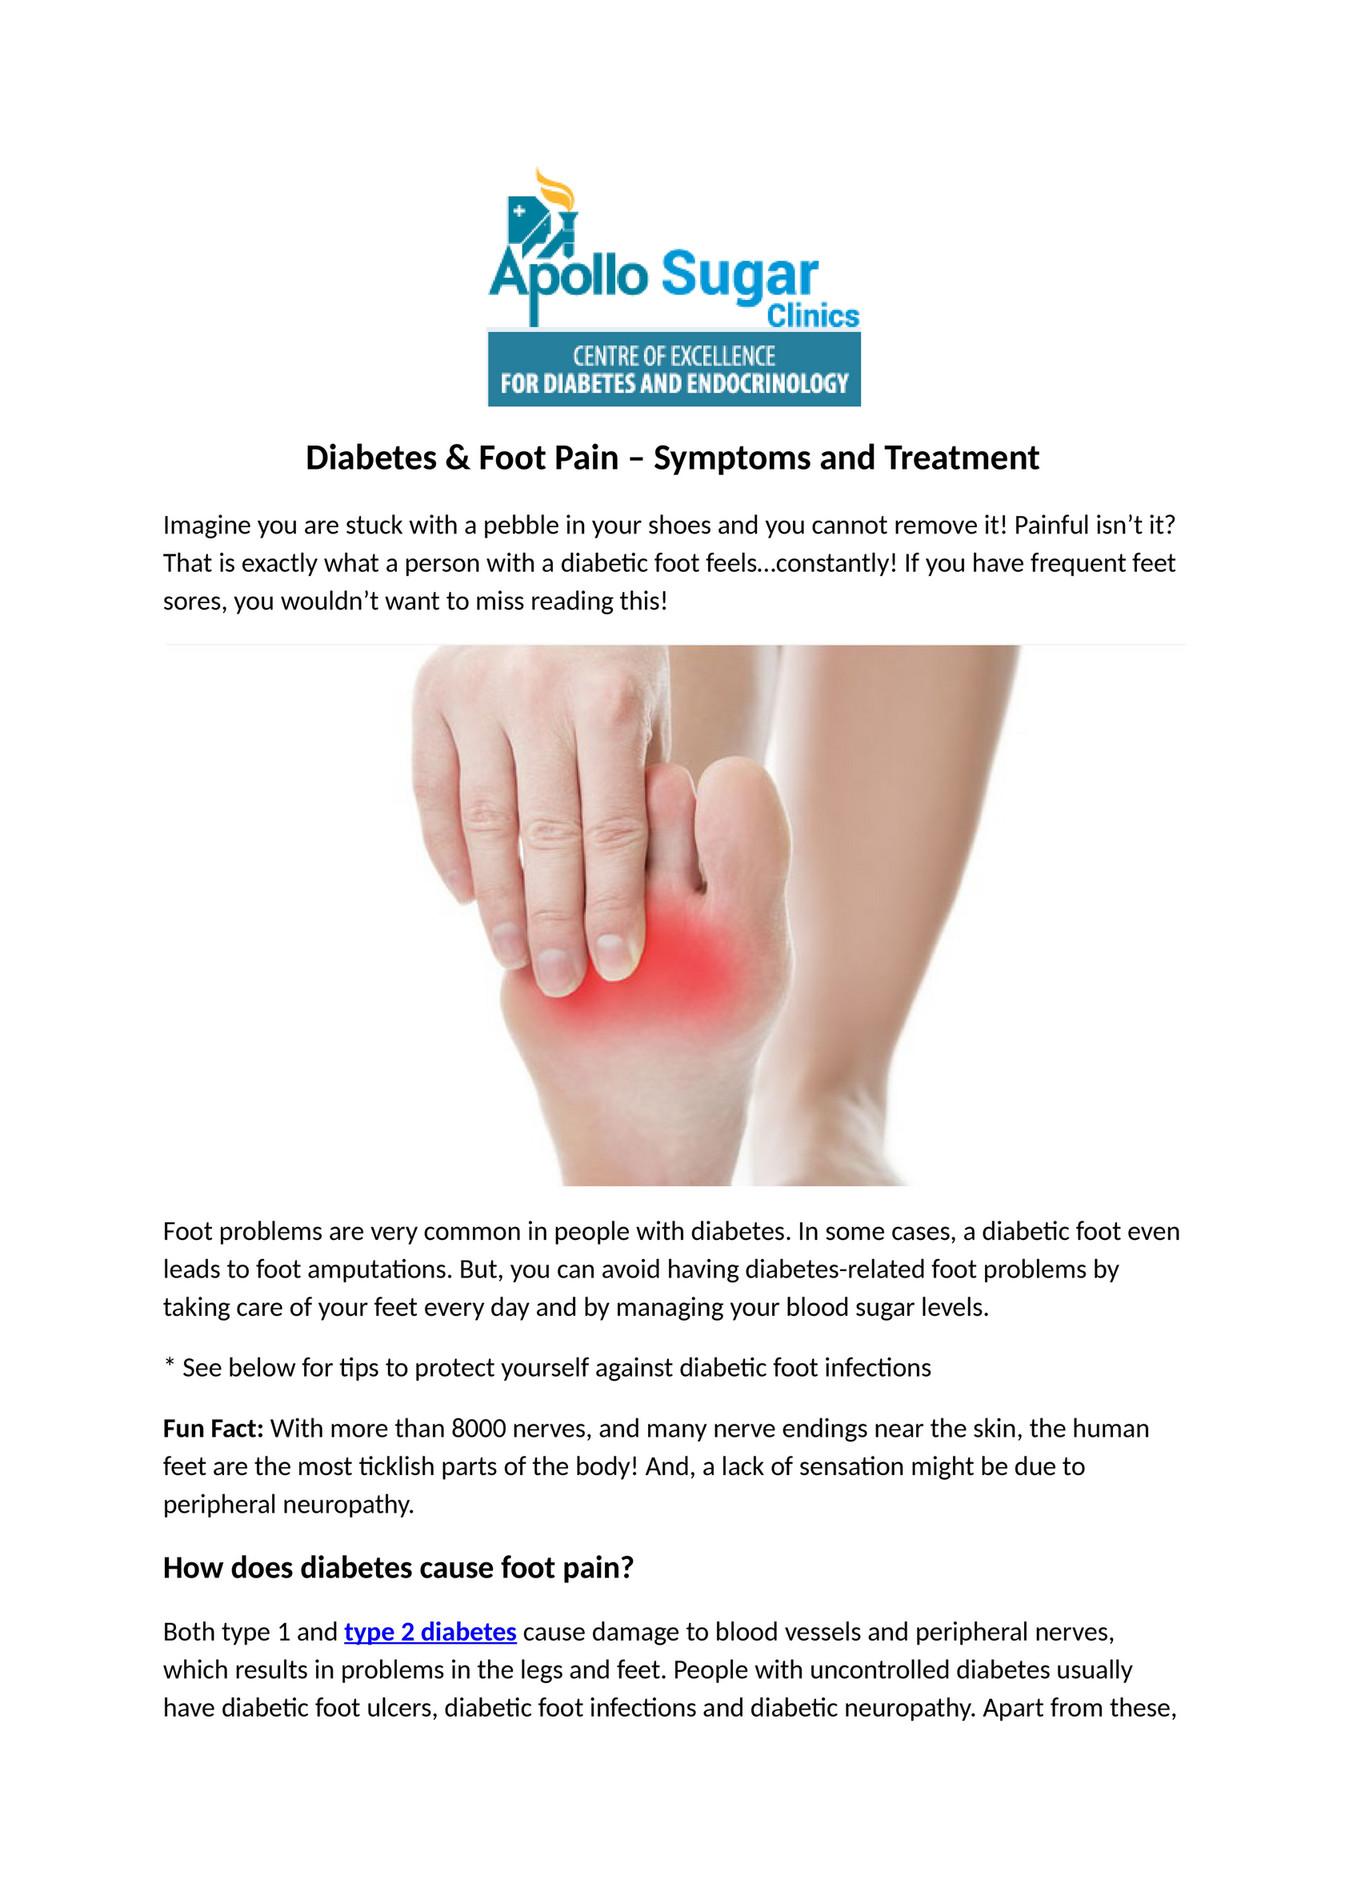 Apollo Sugar Clinic Diabetes Foot Pain Symptoms And